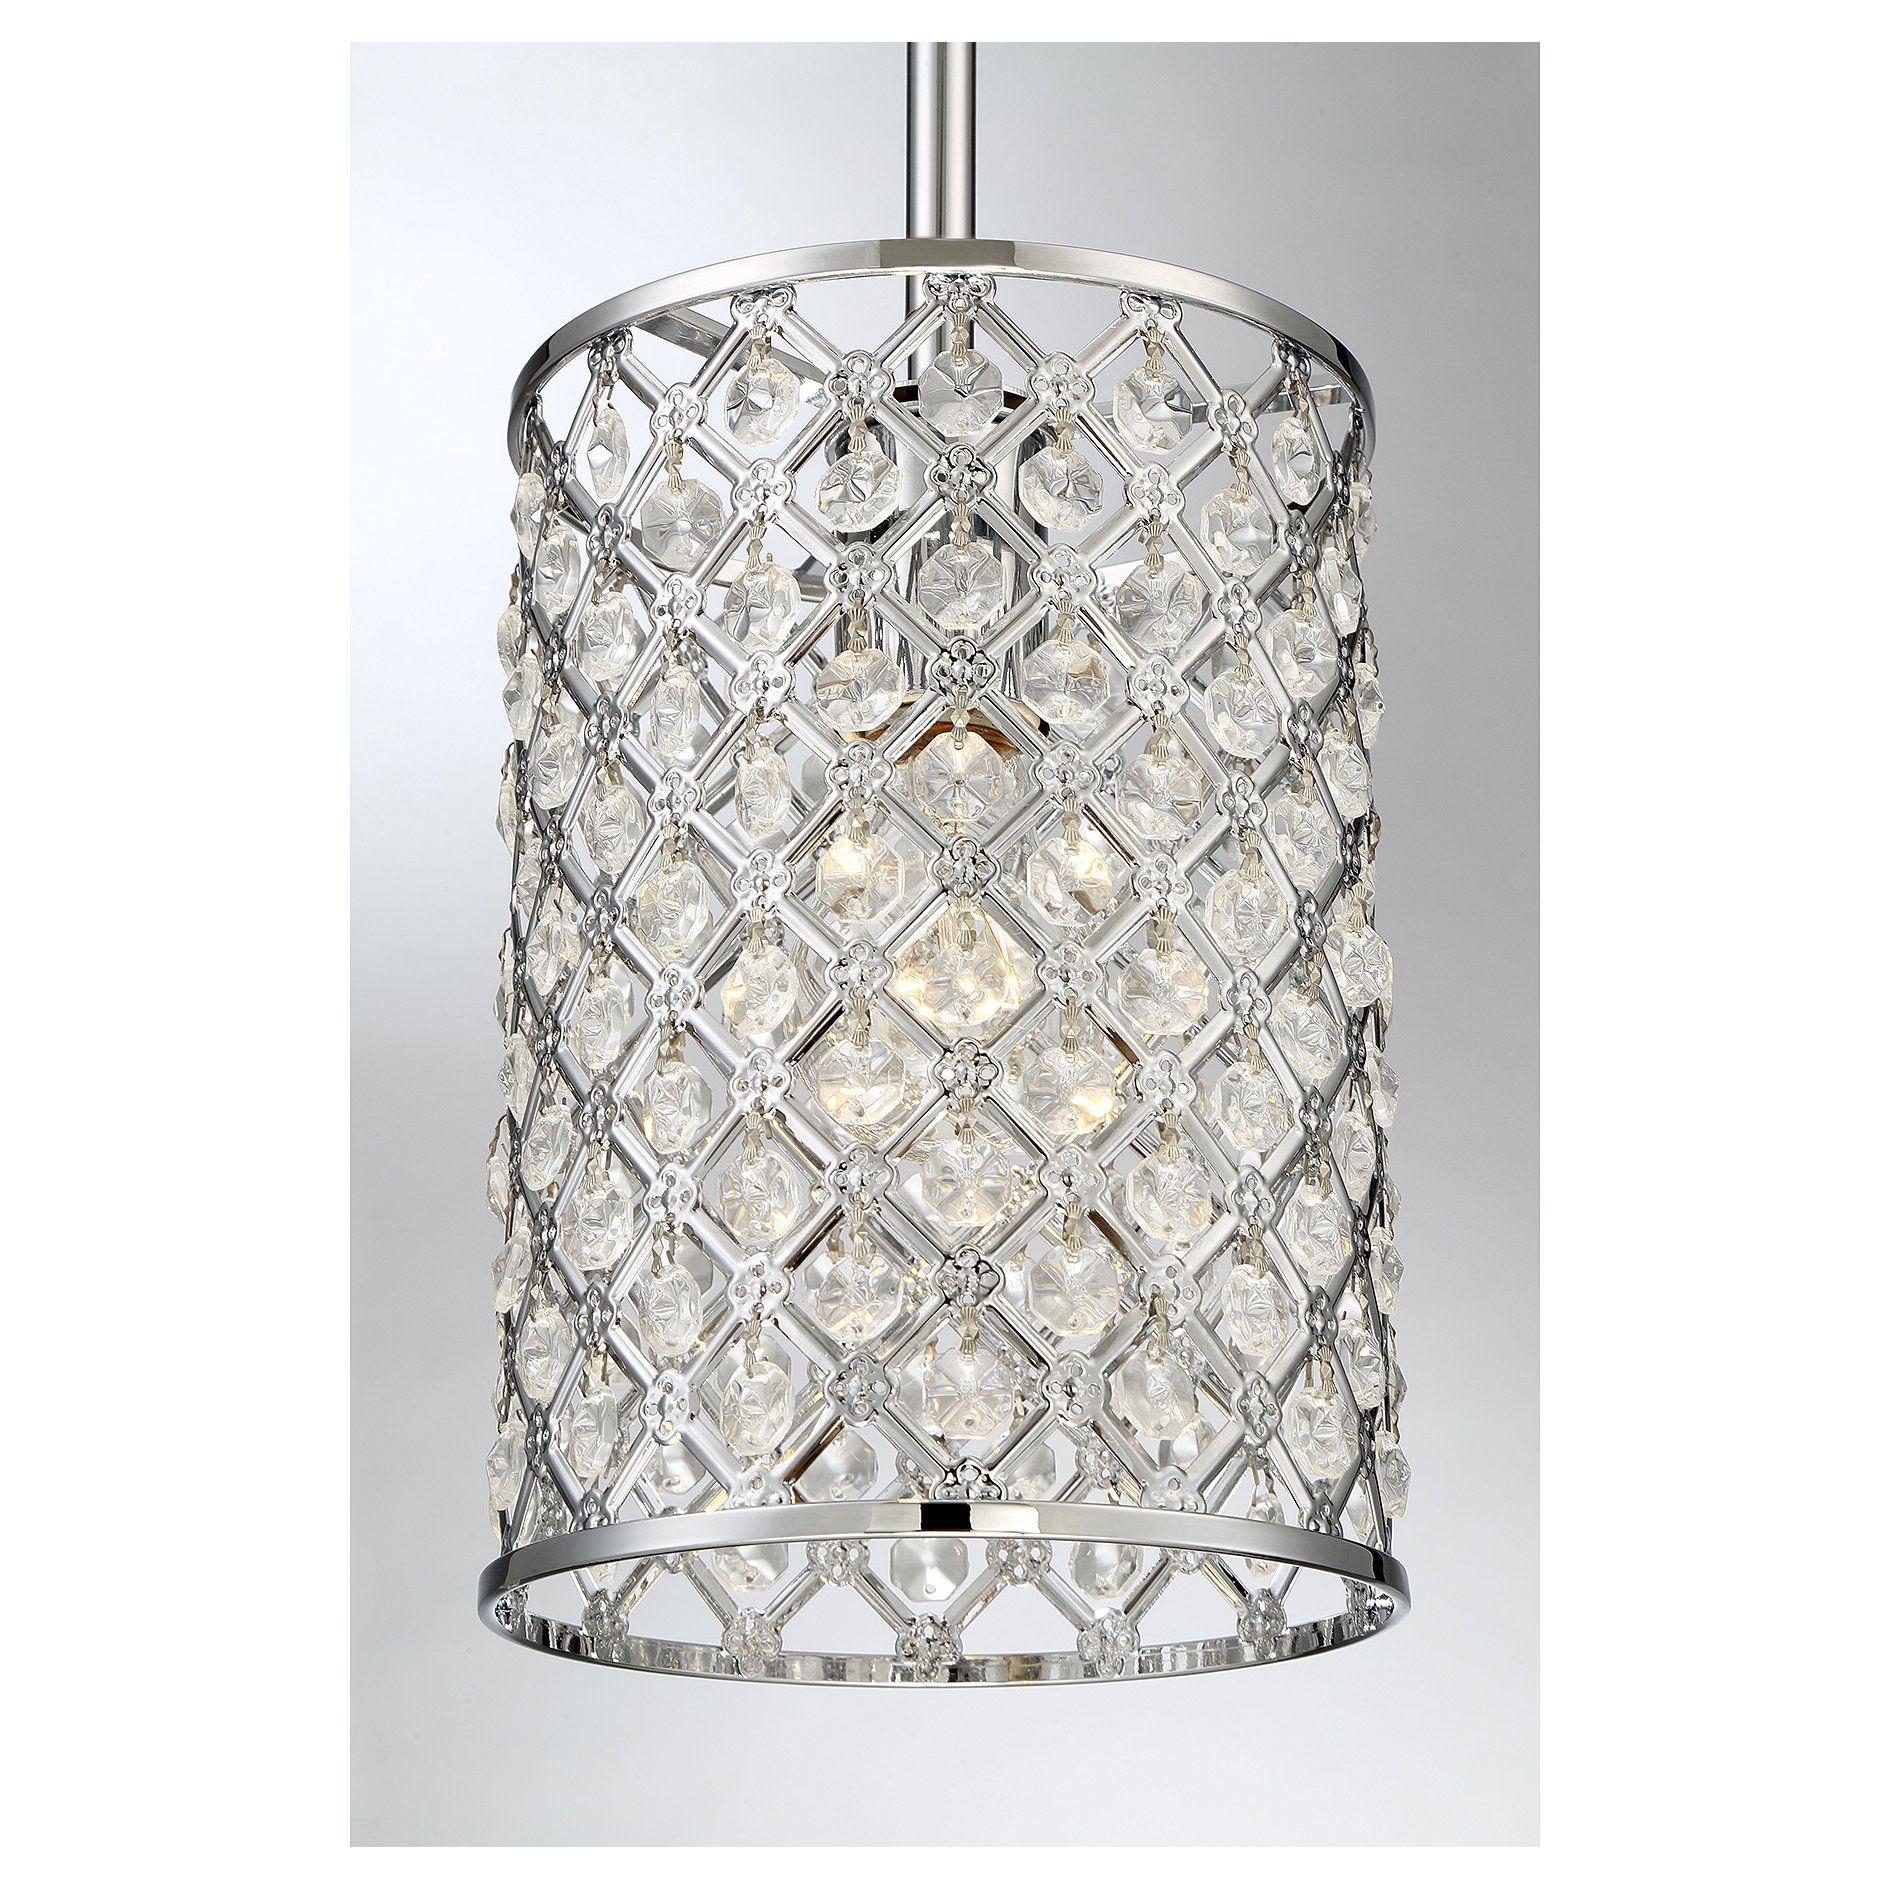 Araujo 1 Light Crystal Pendant | Lighting | Lighting, Mini Inside Jill 4 Light Drum Chandeliers (View 19 of 30)